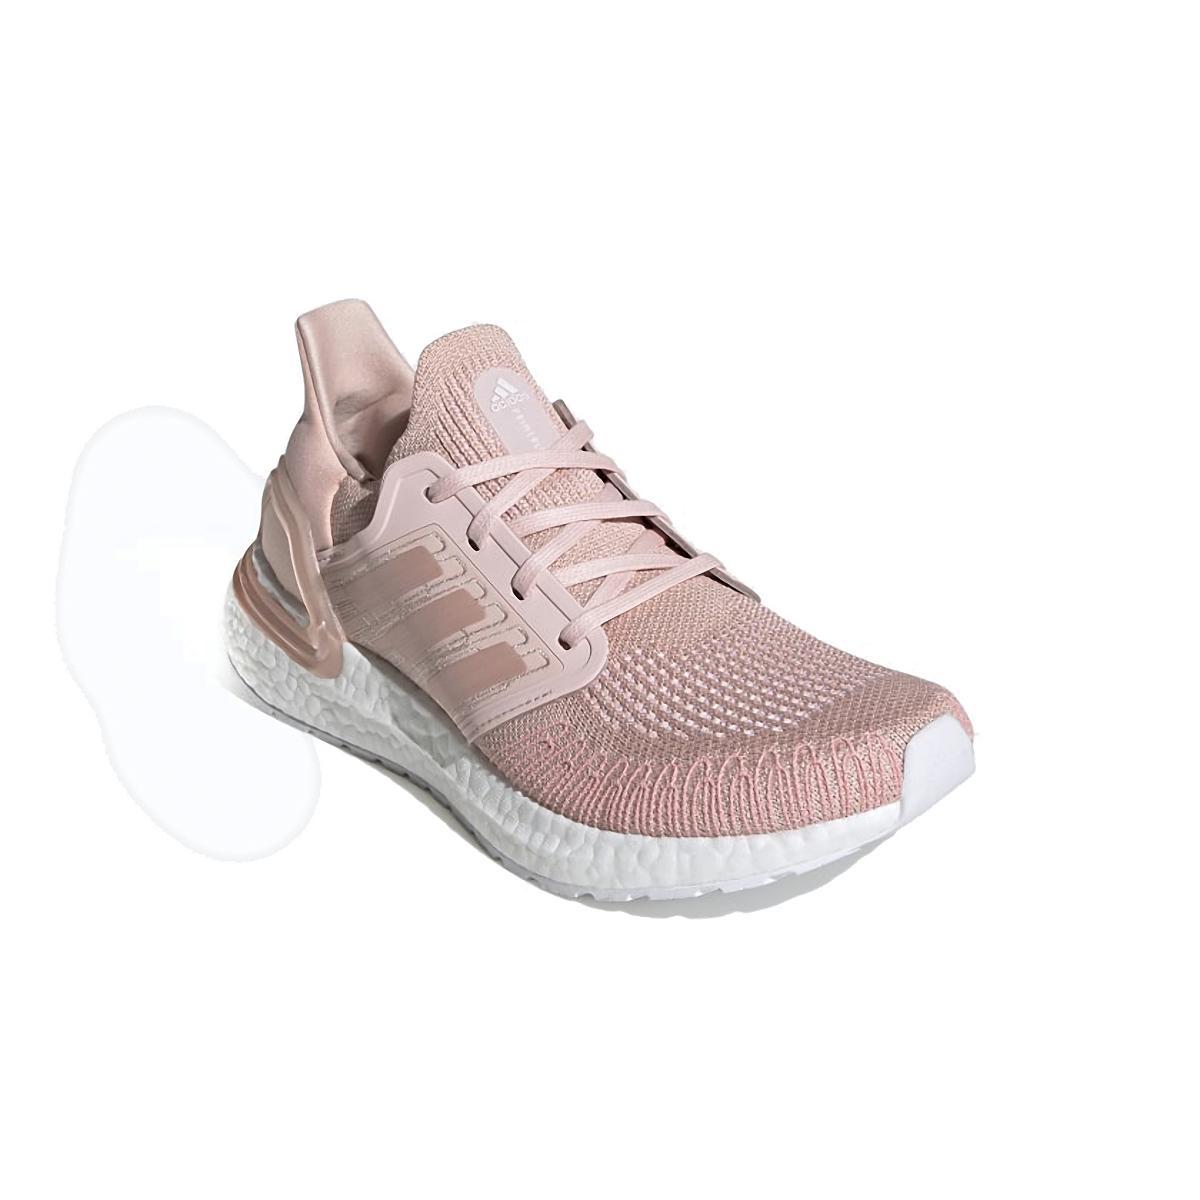 Women's Adidas Ultraboost 20 Running Shoe - Color: Vapour Pink/Cloud White - Size: 5 - Width: Regular, Vapour Pink/Cloud White, large, image 4